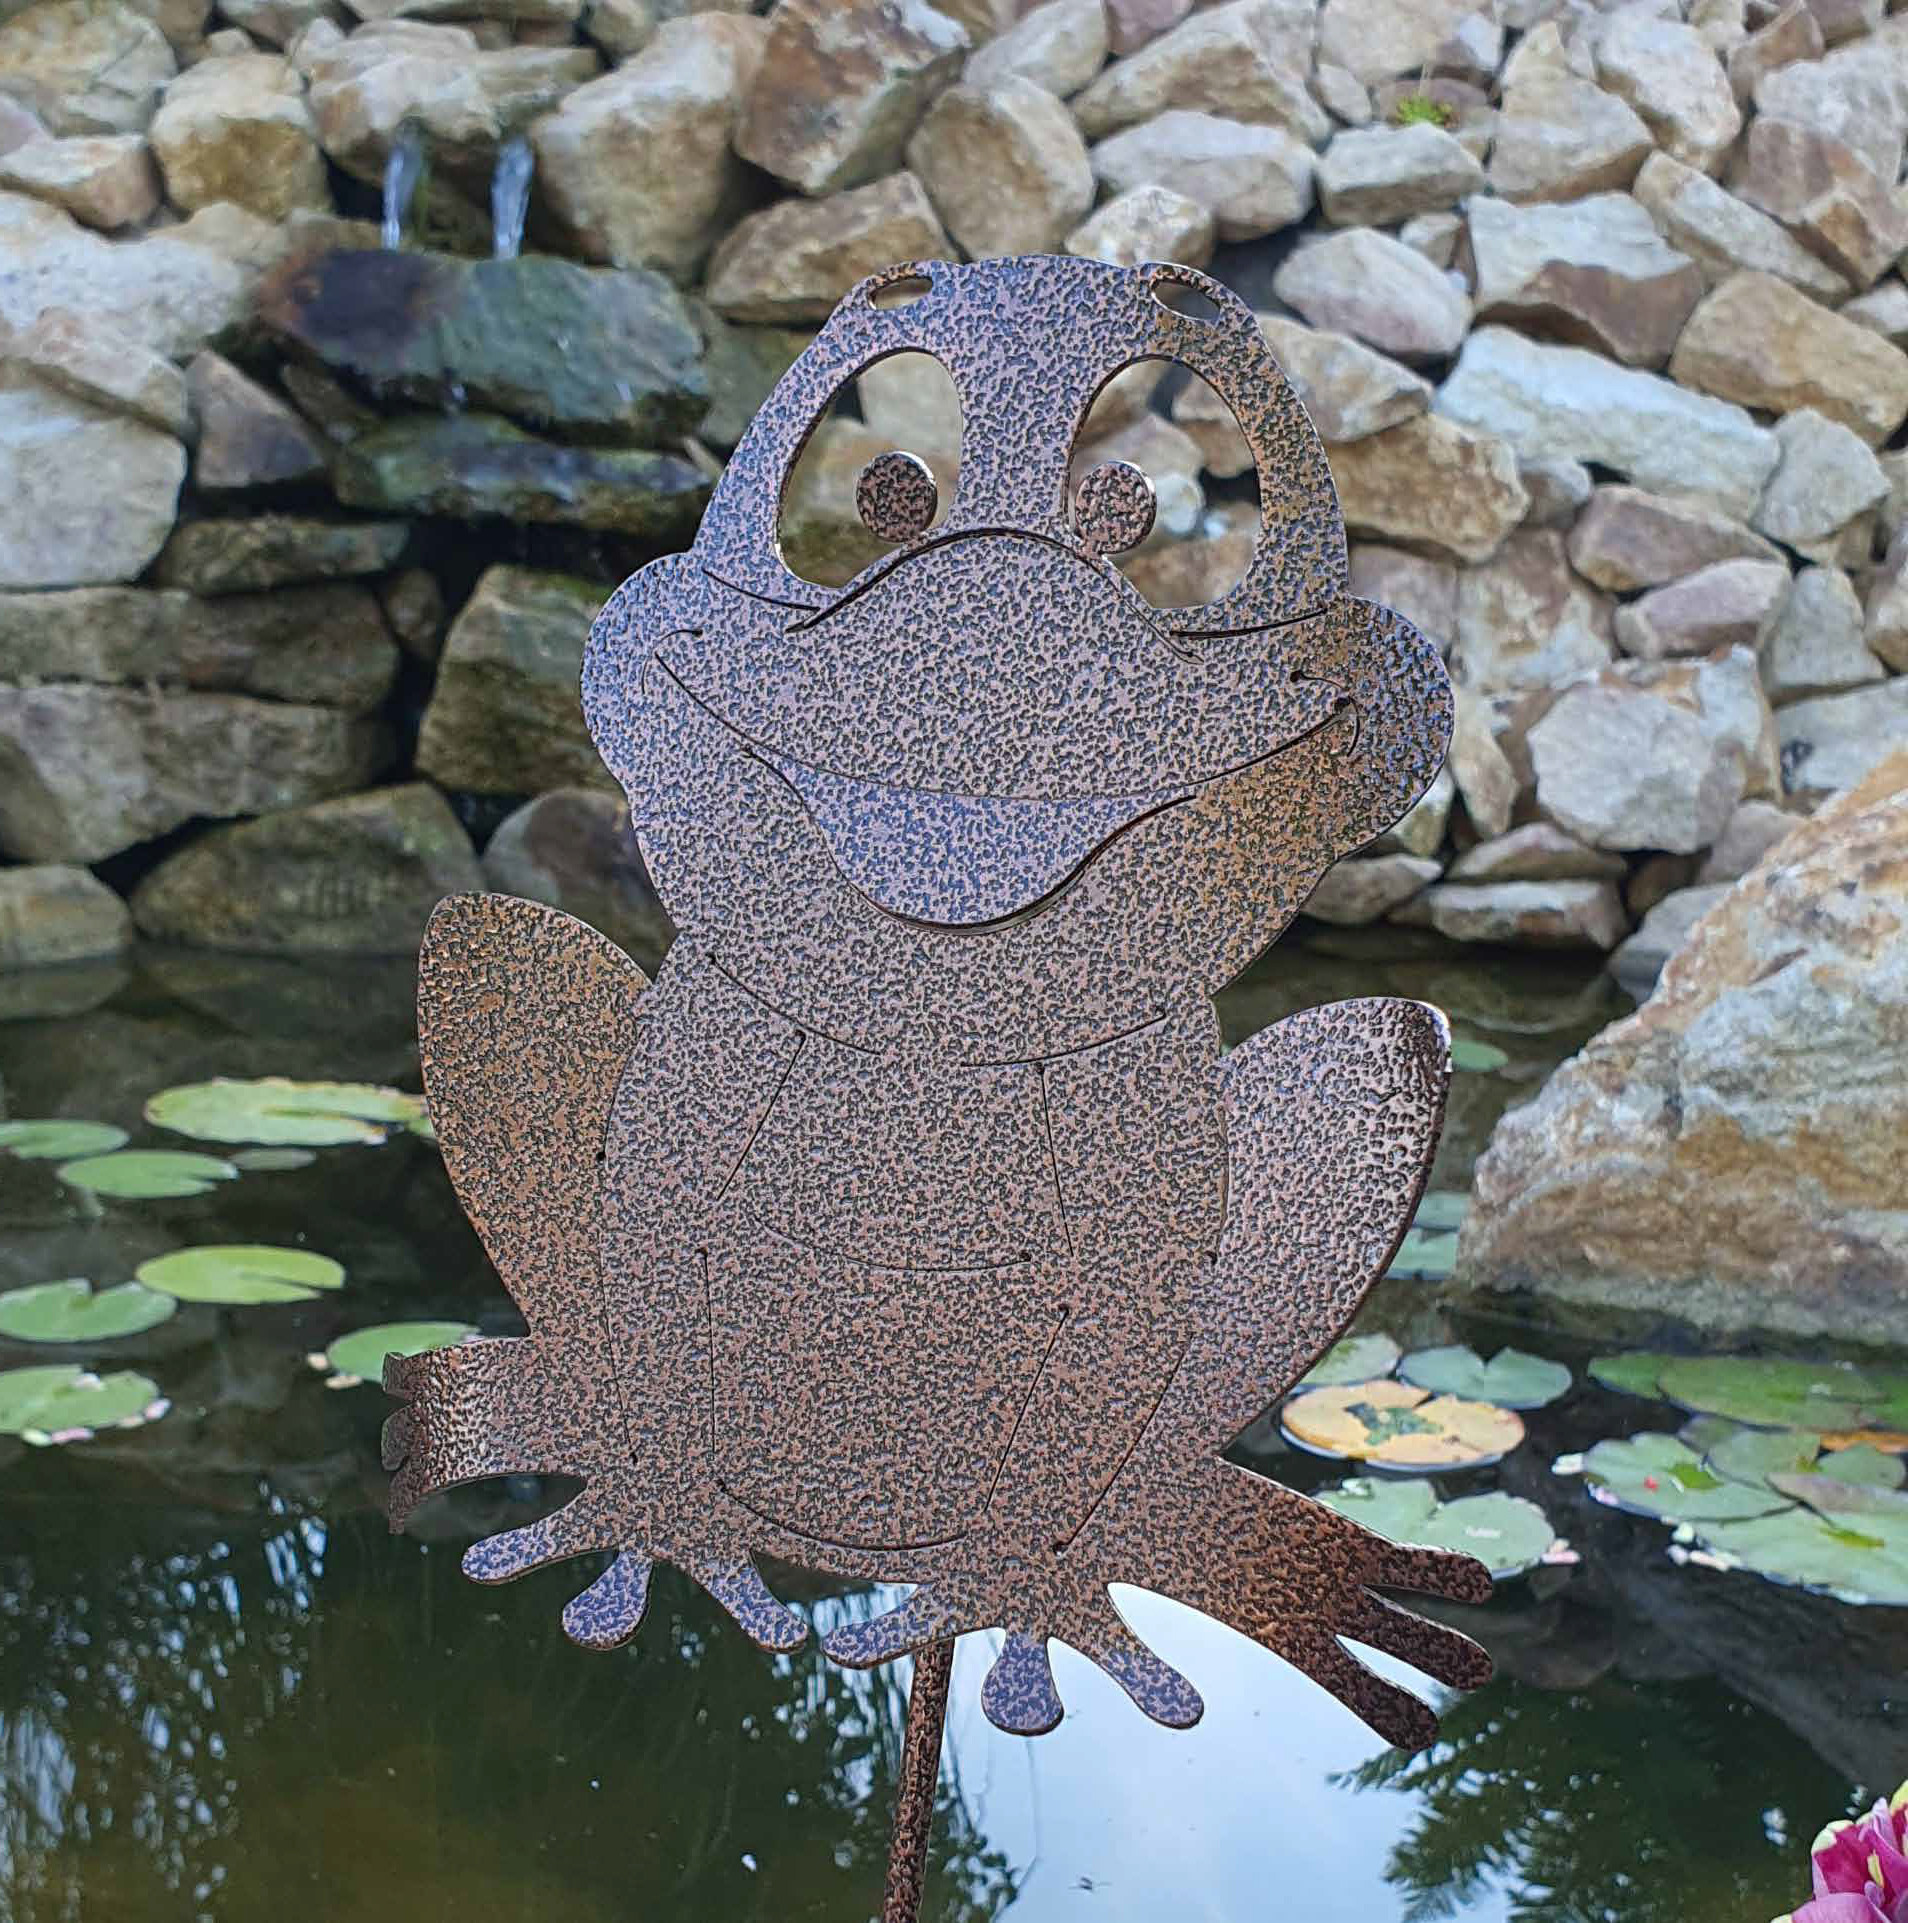 Zapichovátko žába